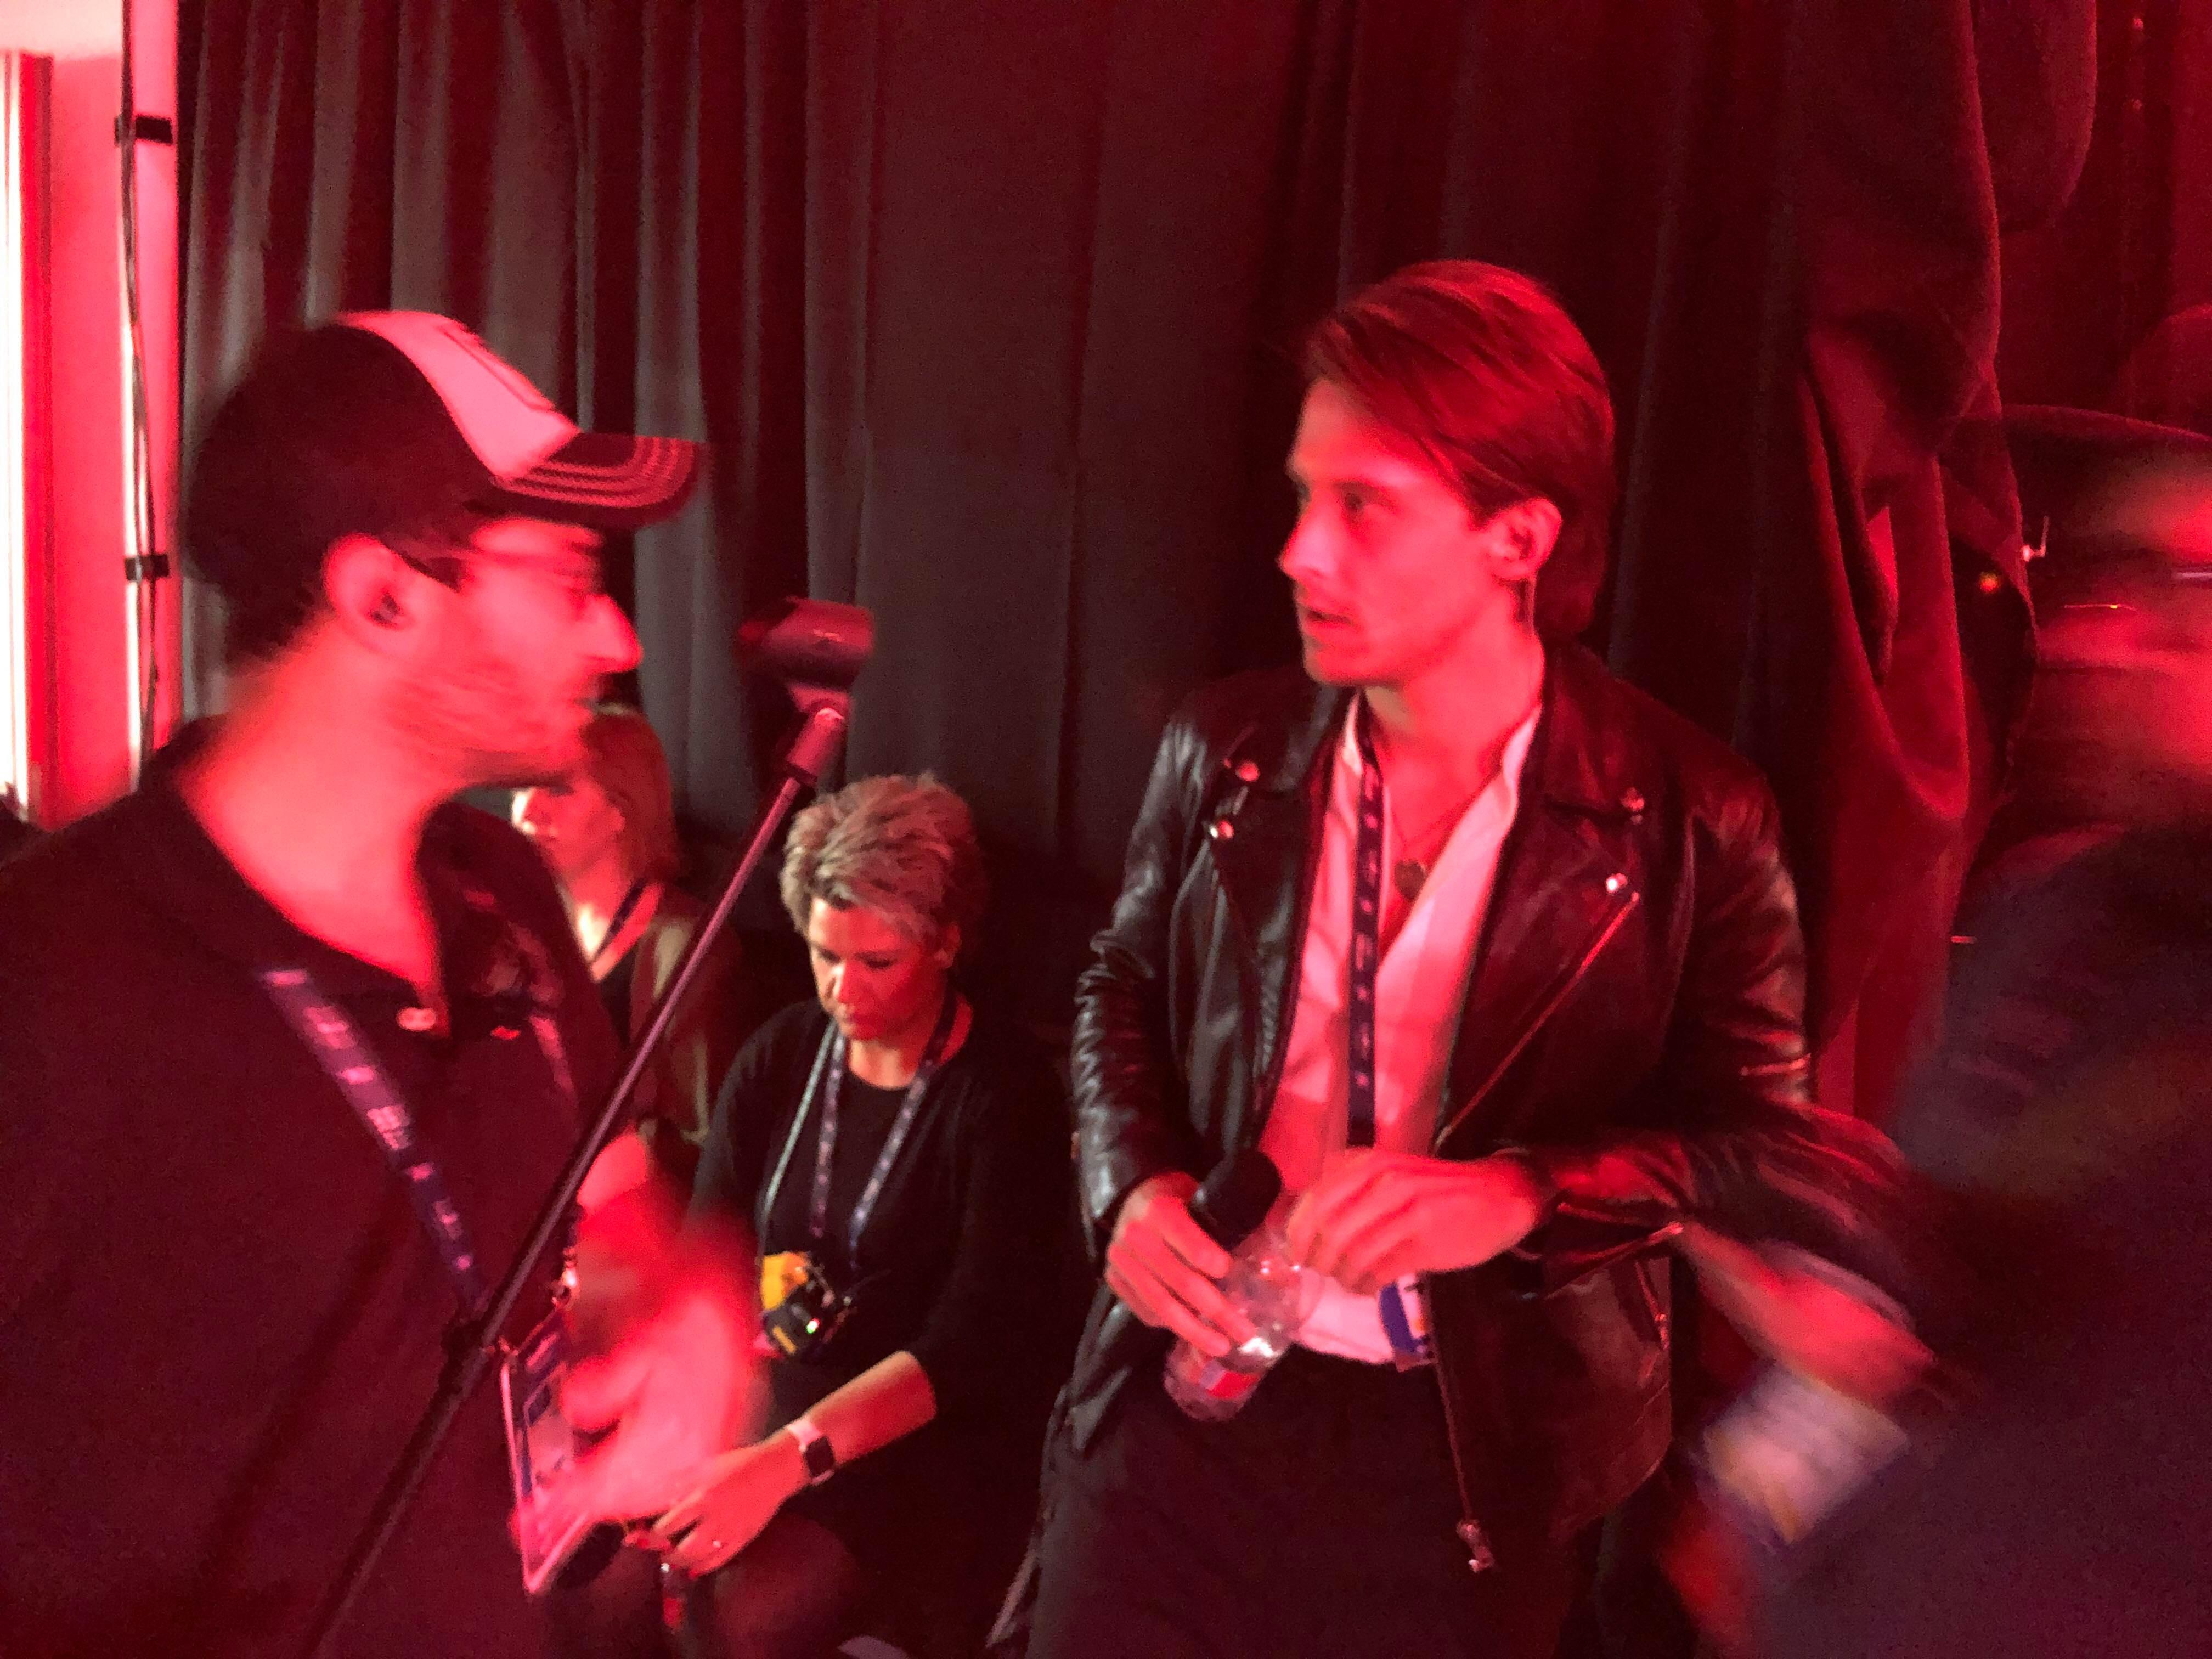 Andres Putting/EBU